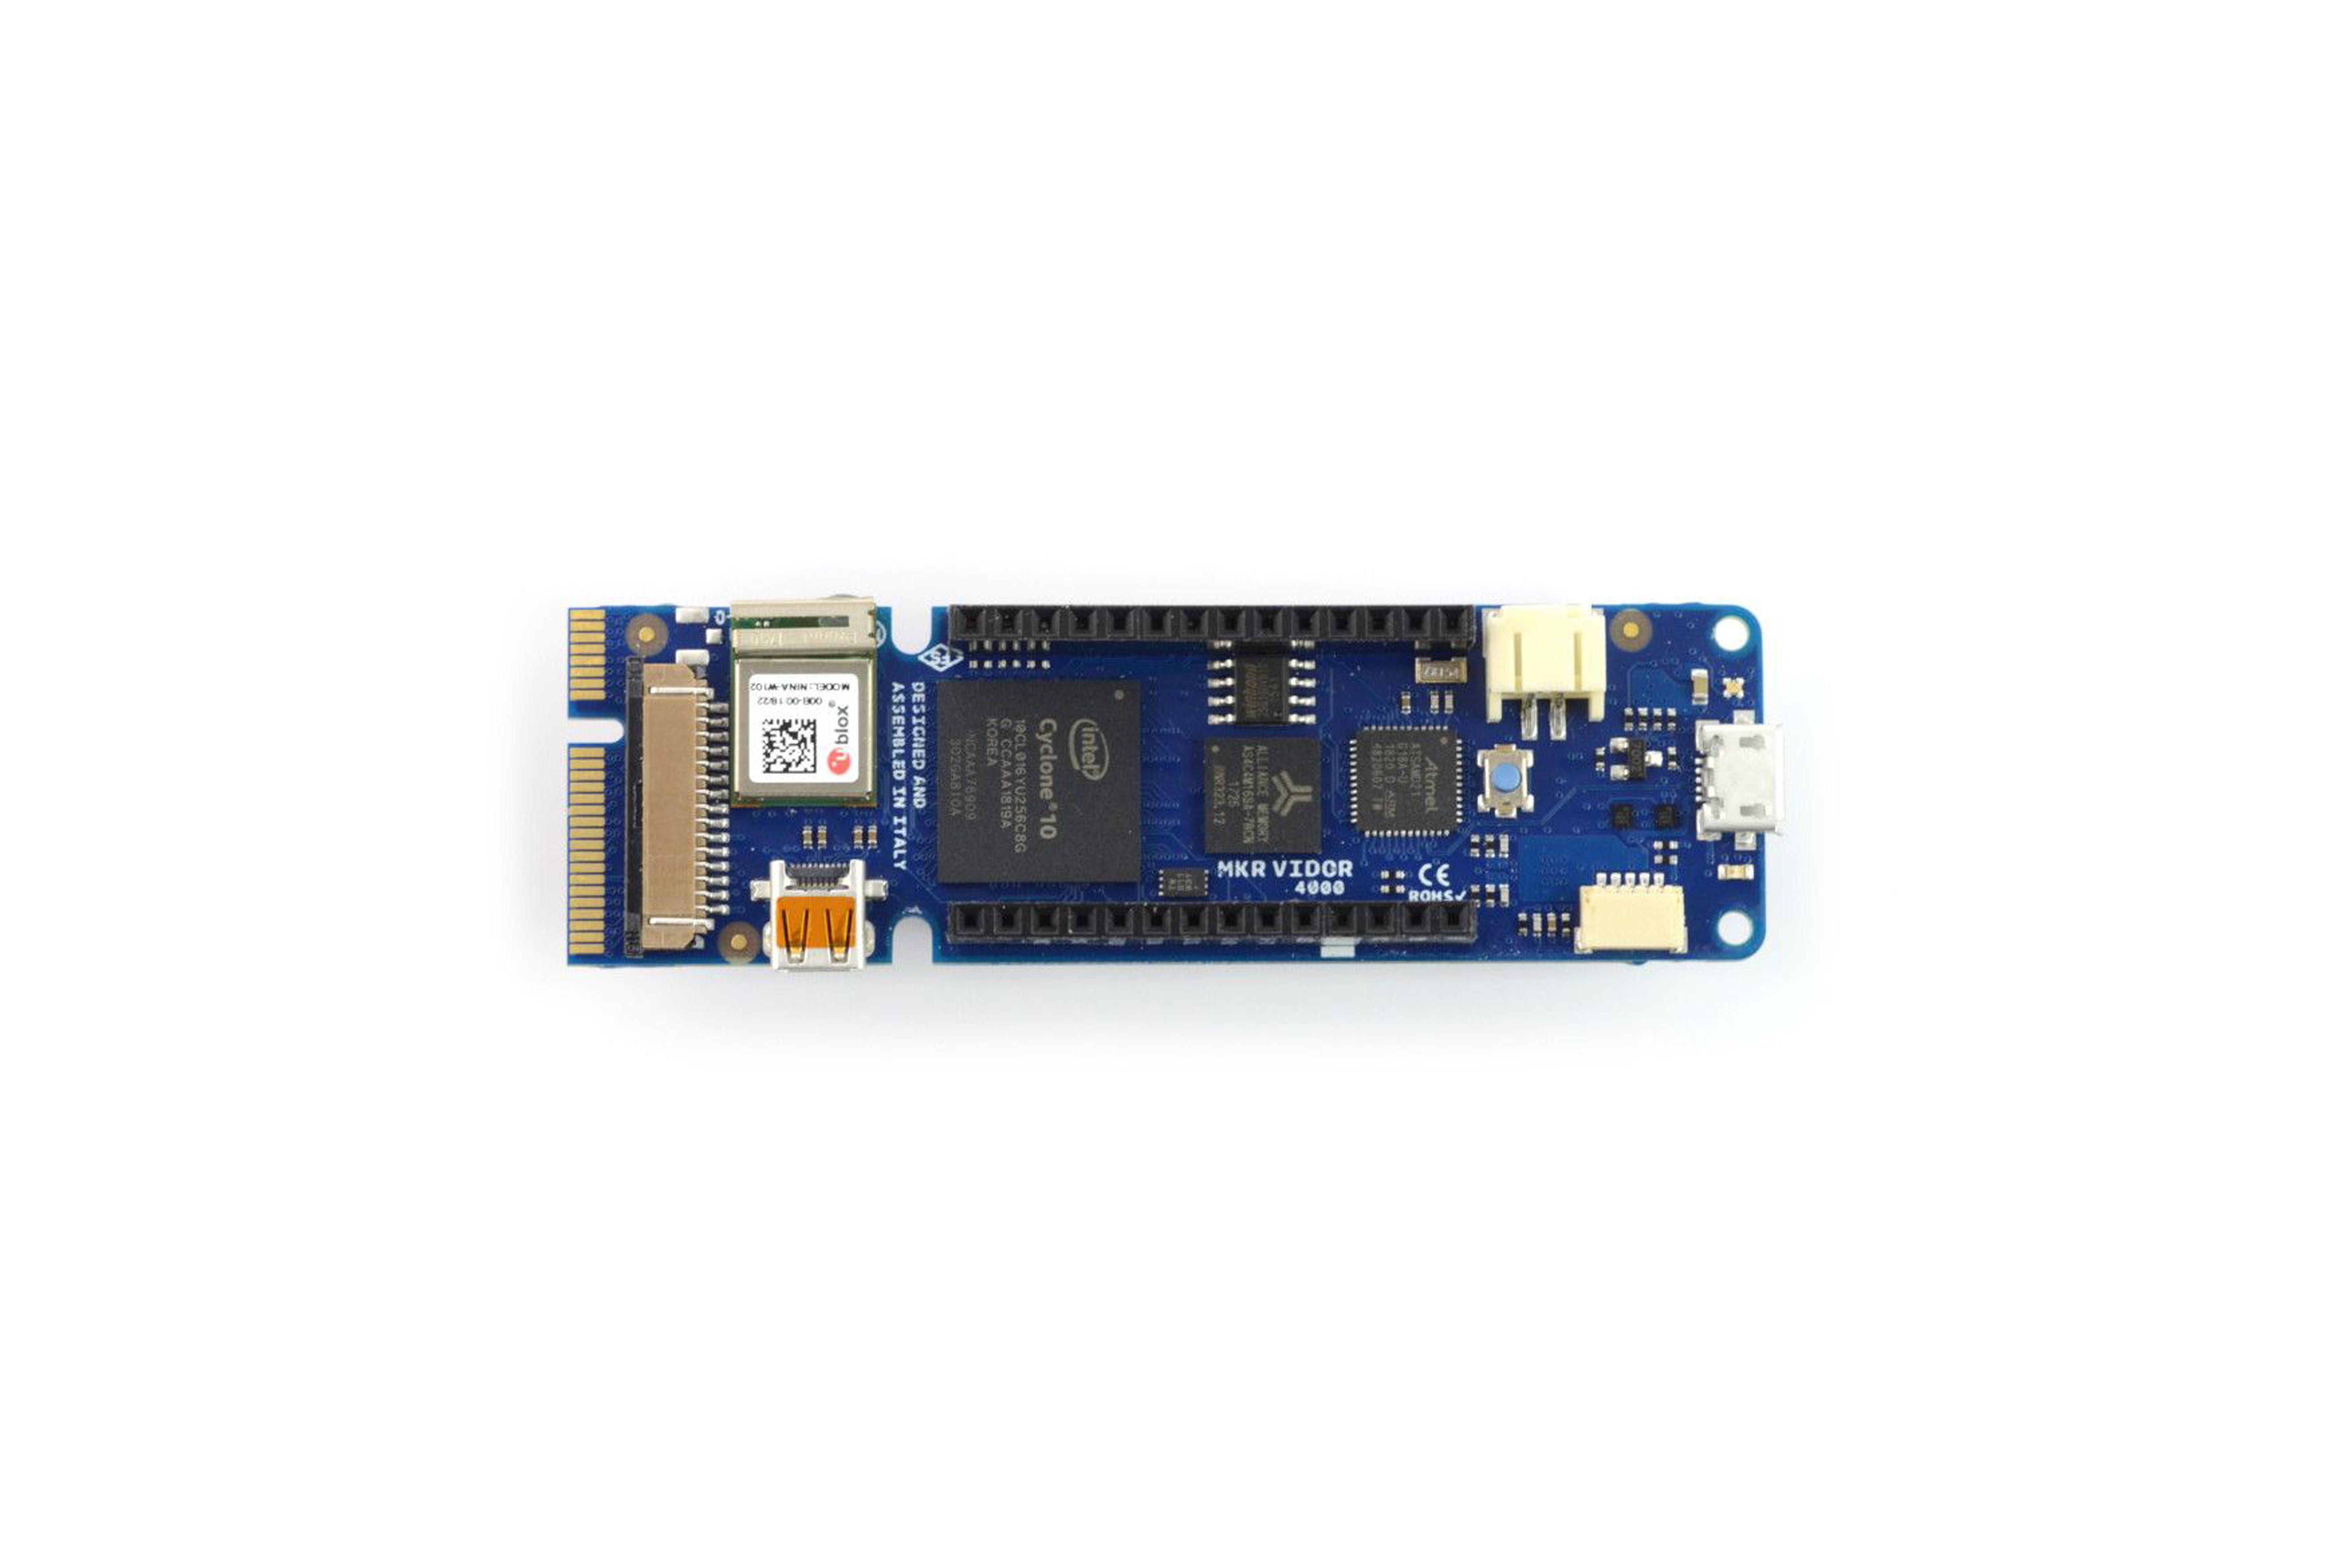 Arduino(アルデュイーノ) MKR VIDOR 4000